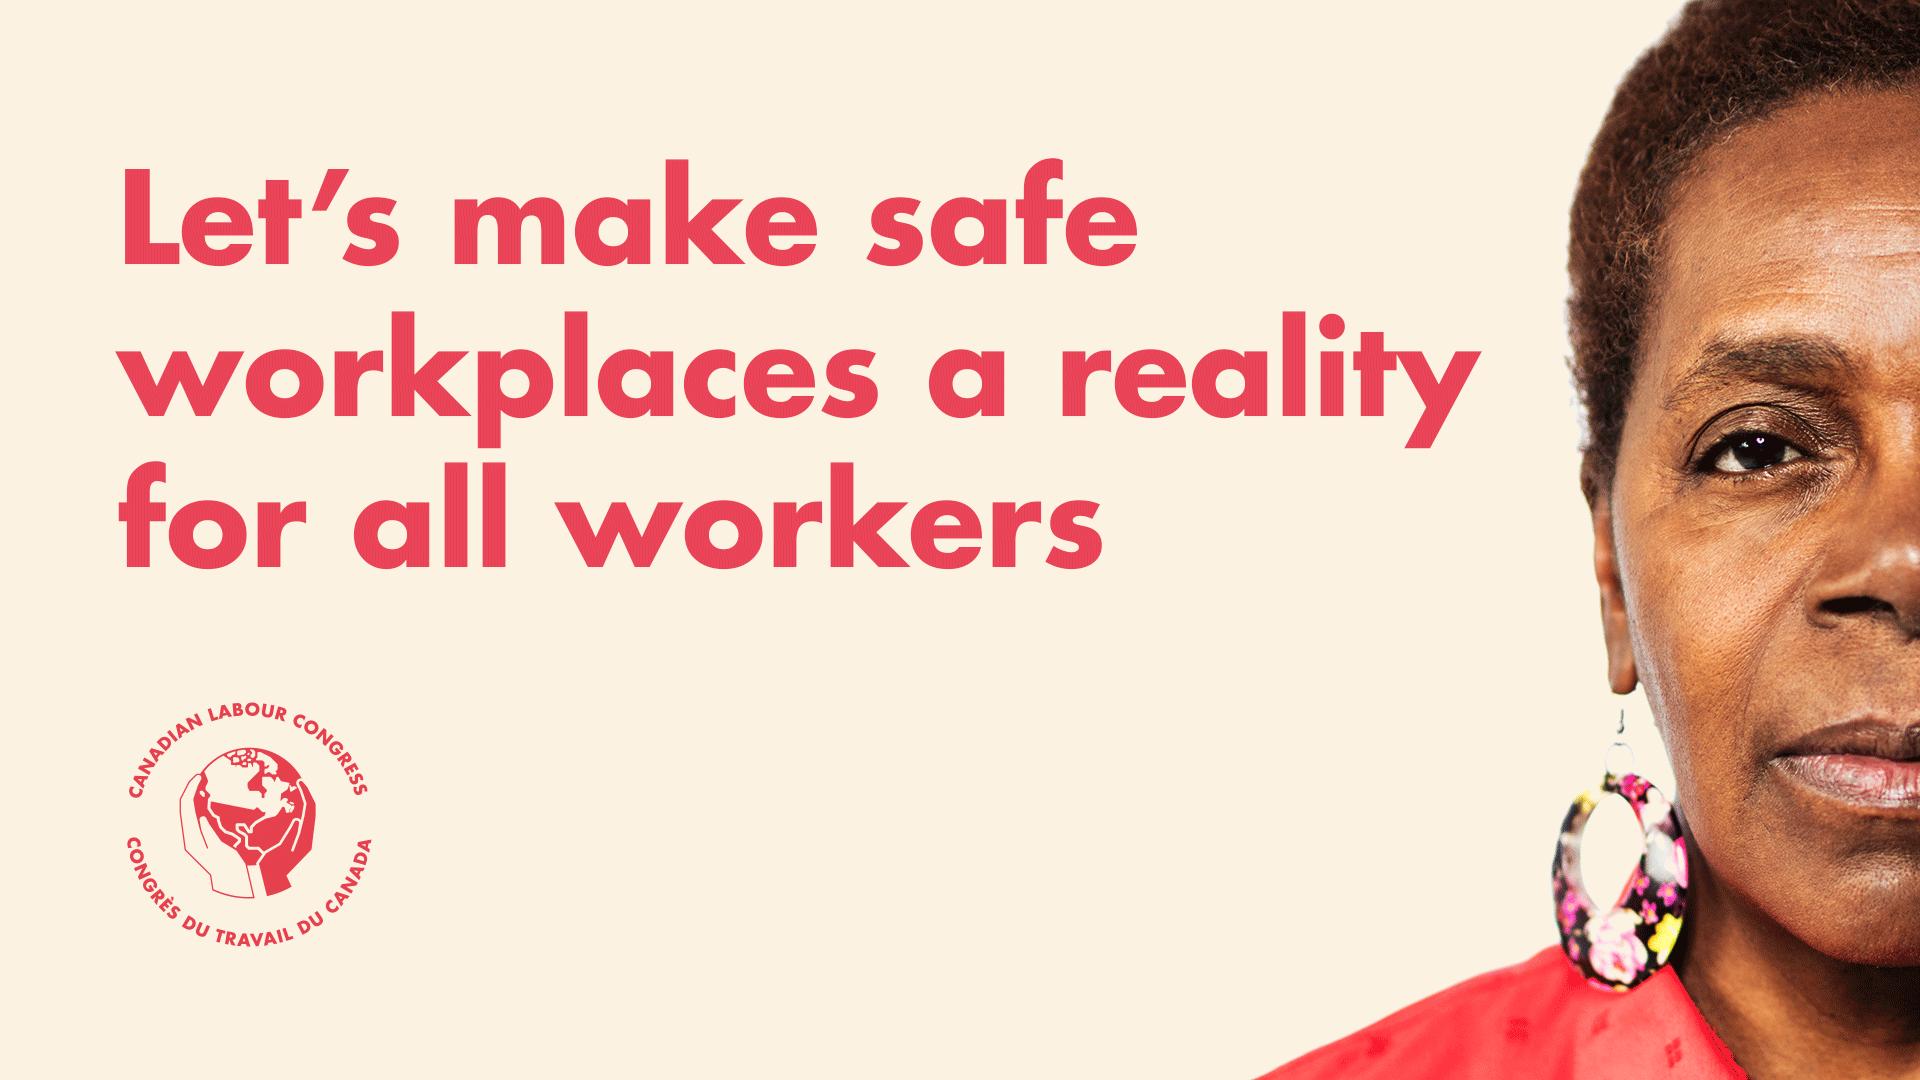 CLC Workplace Violence Survey